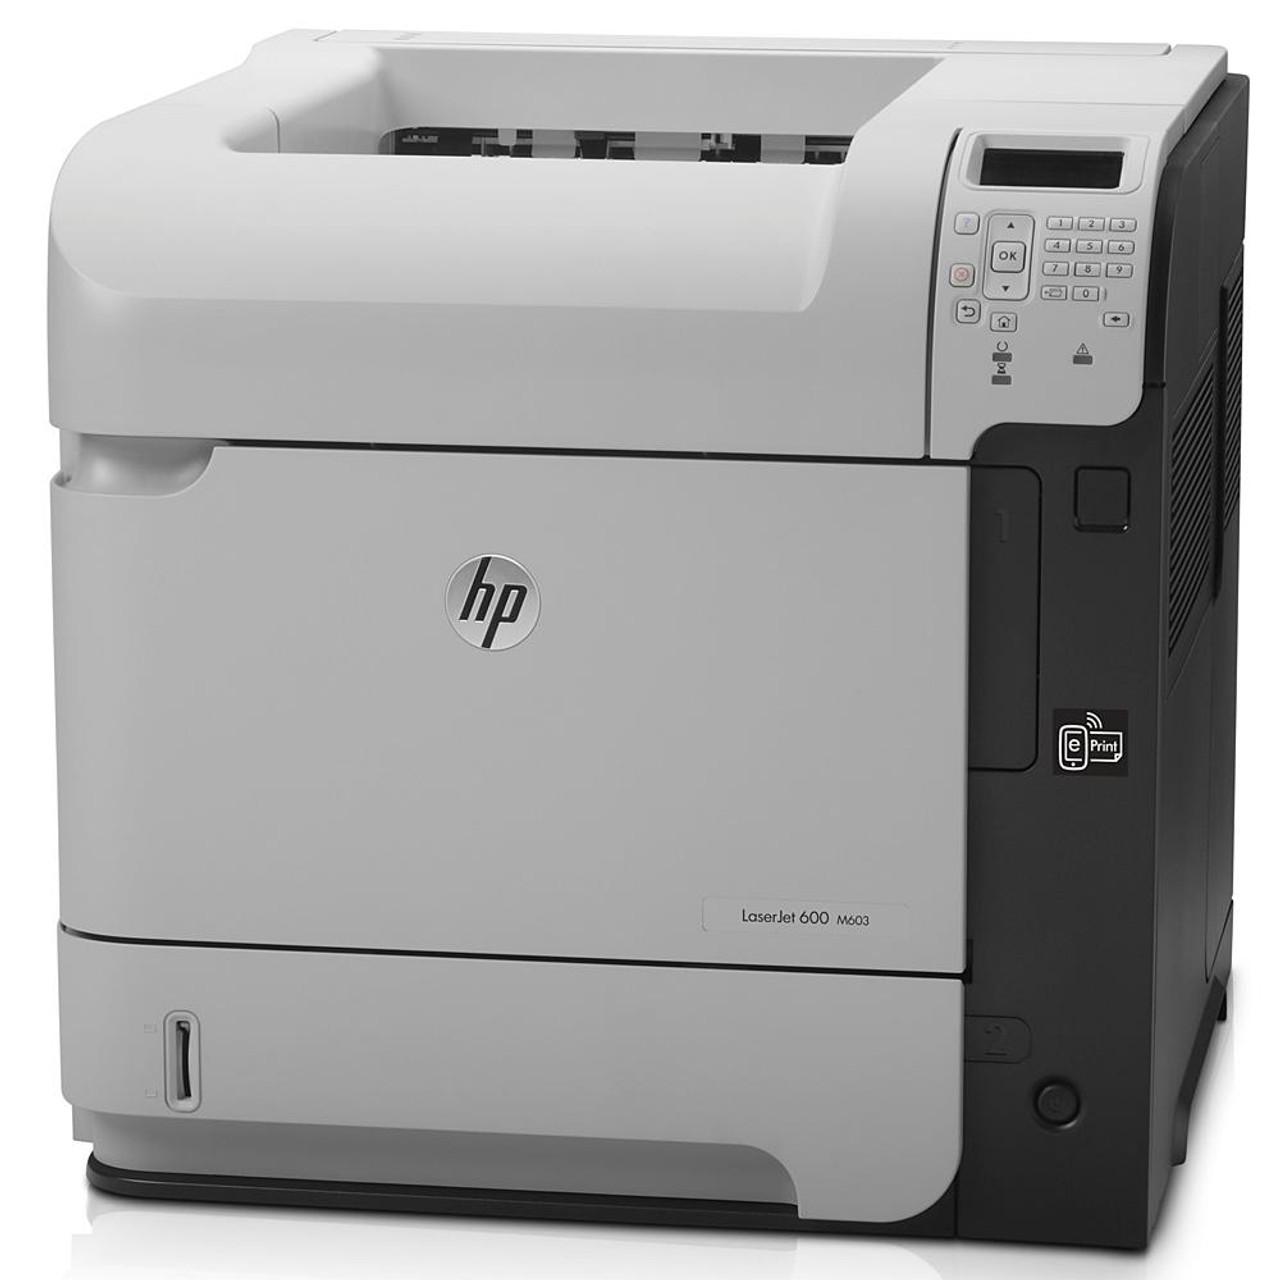 HP LaserJet Enterprise 600 M603DN - CE995A#BGJ - HP Laser Printer for sale